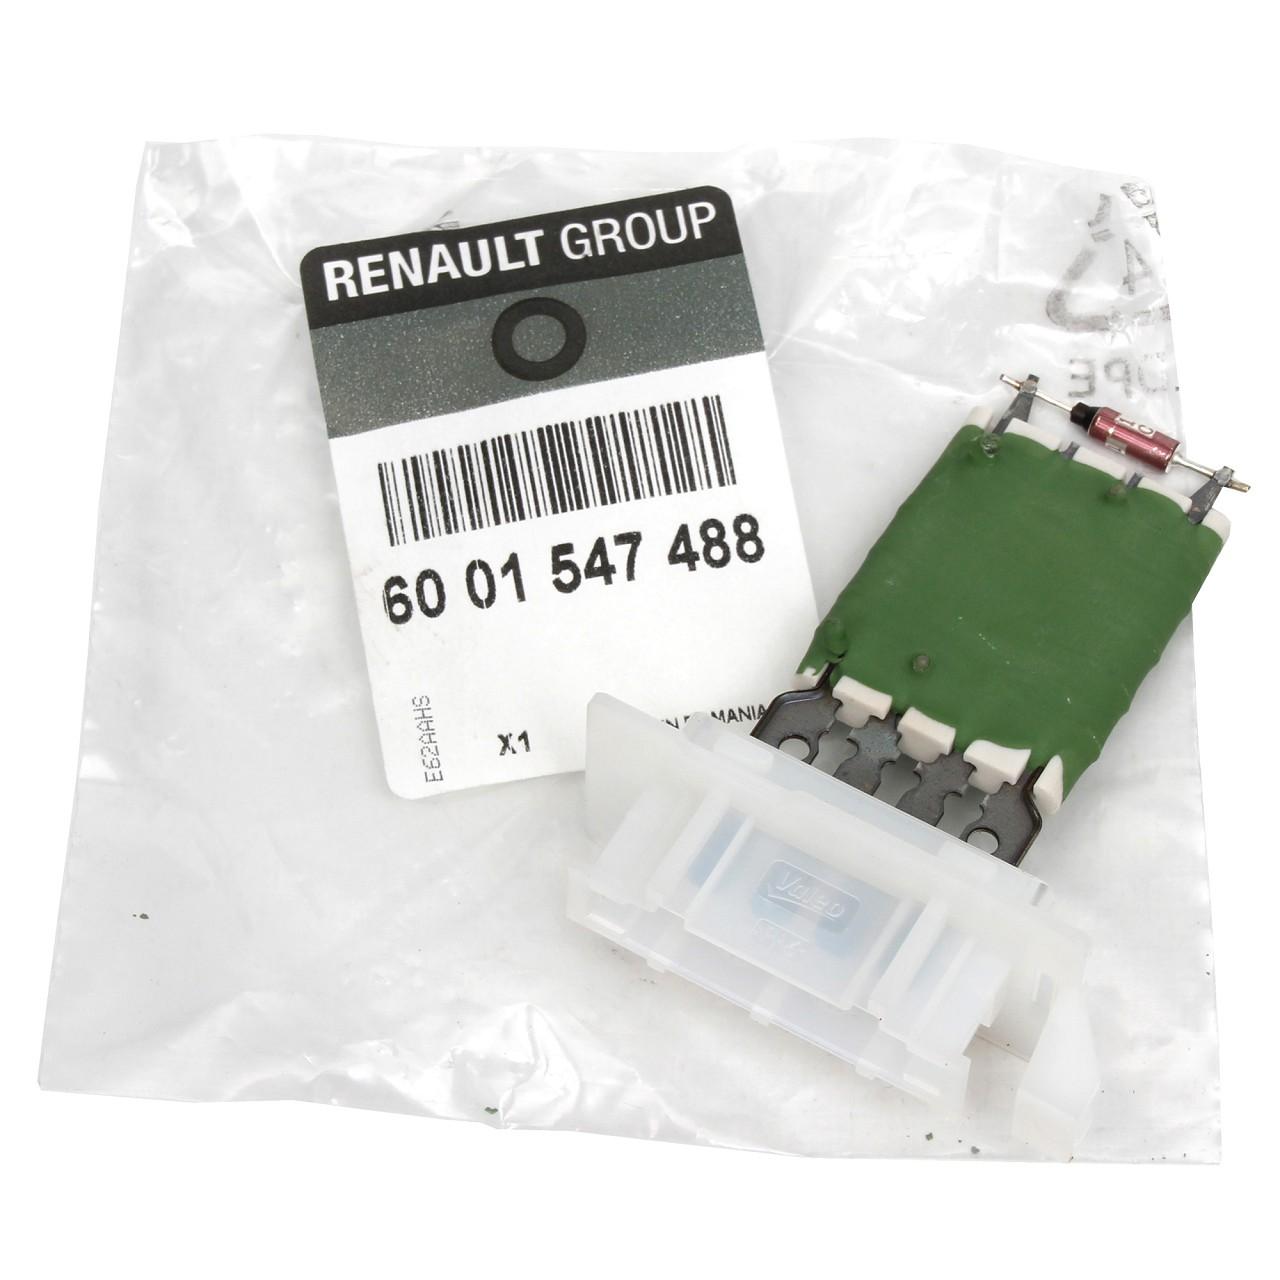 ORIGINAL Renault Dacia Widerstand Vorwiderstand Innenraumgebläse 6001547488